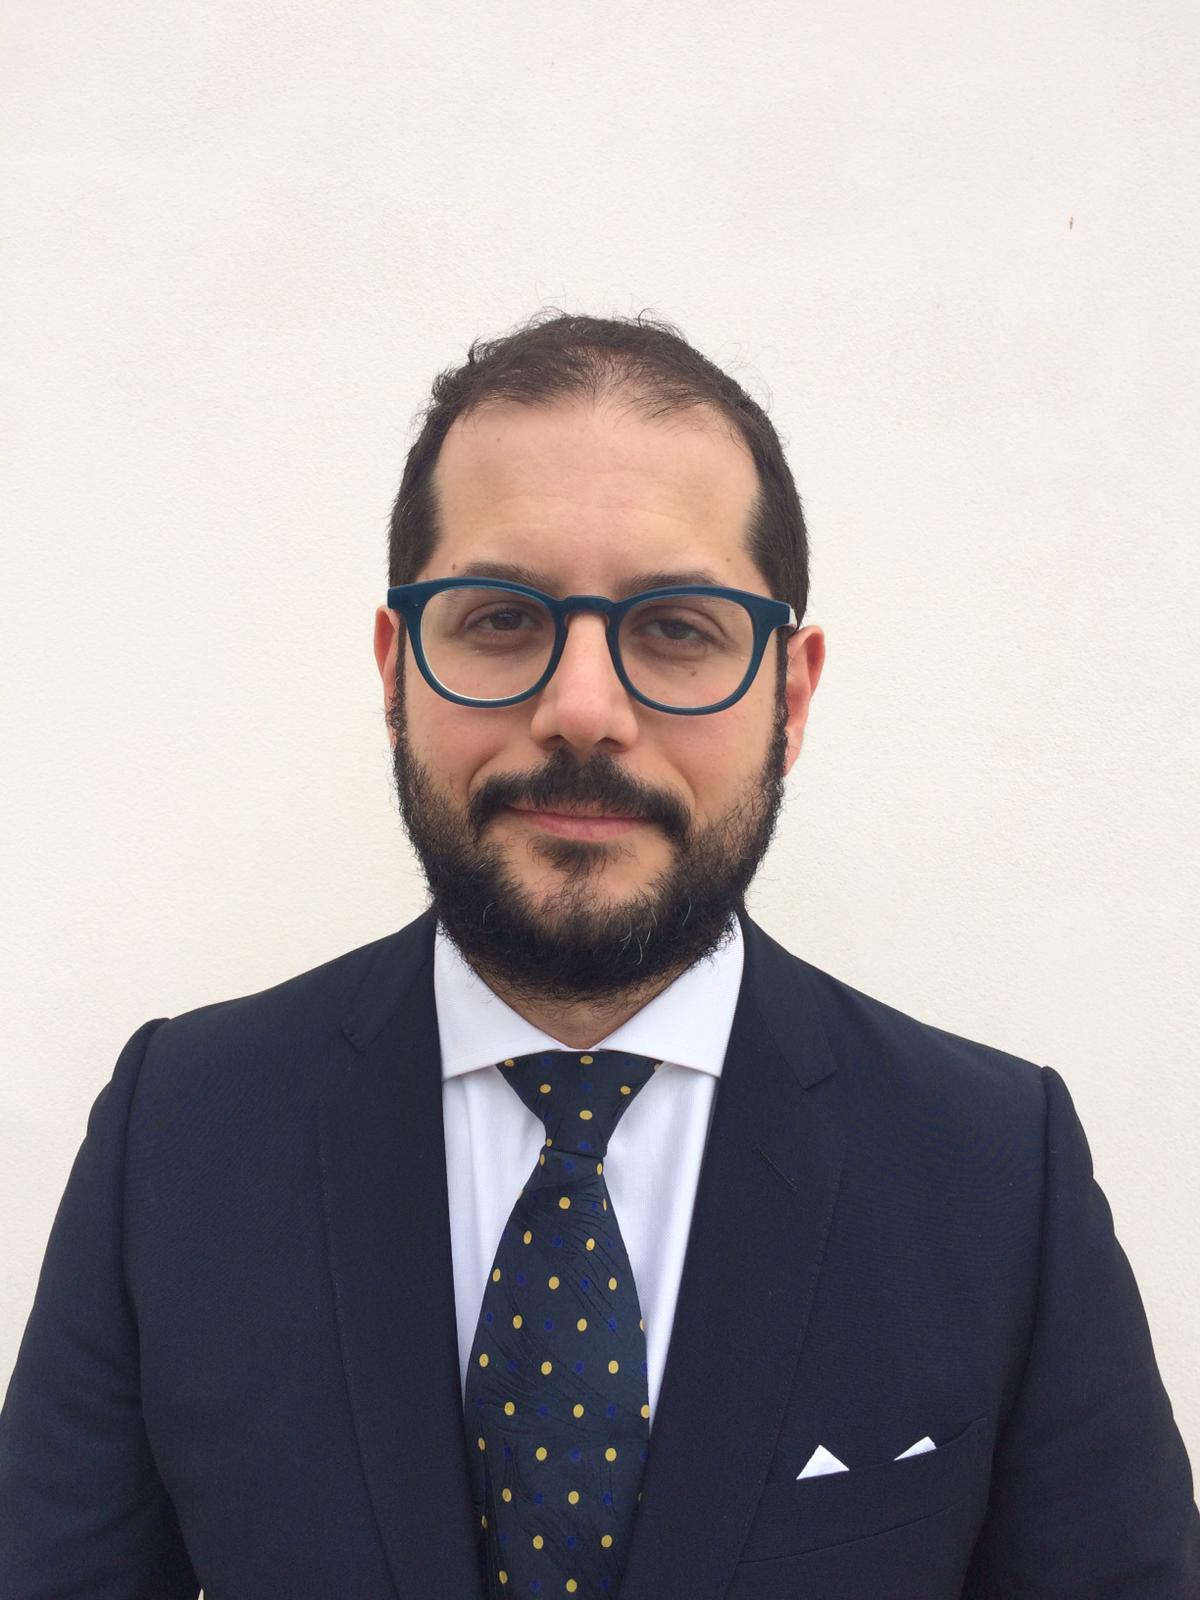 Avv. Biagio Craparotta